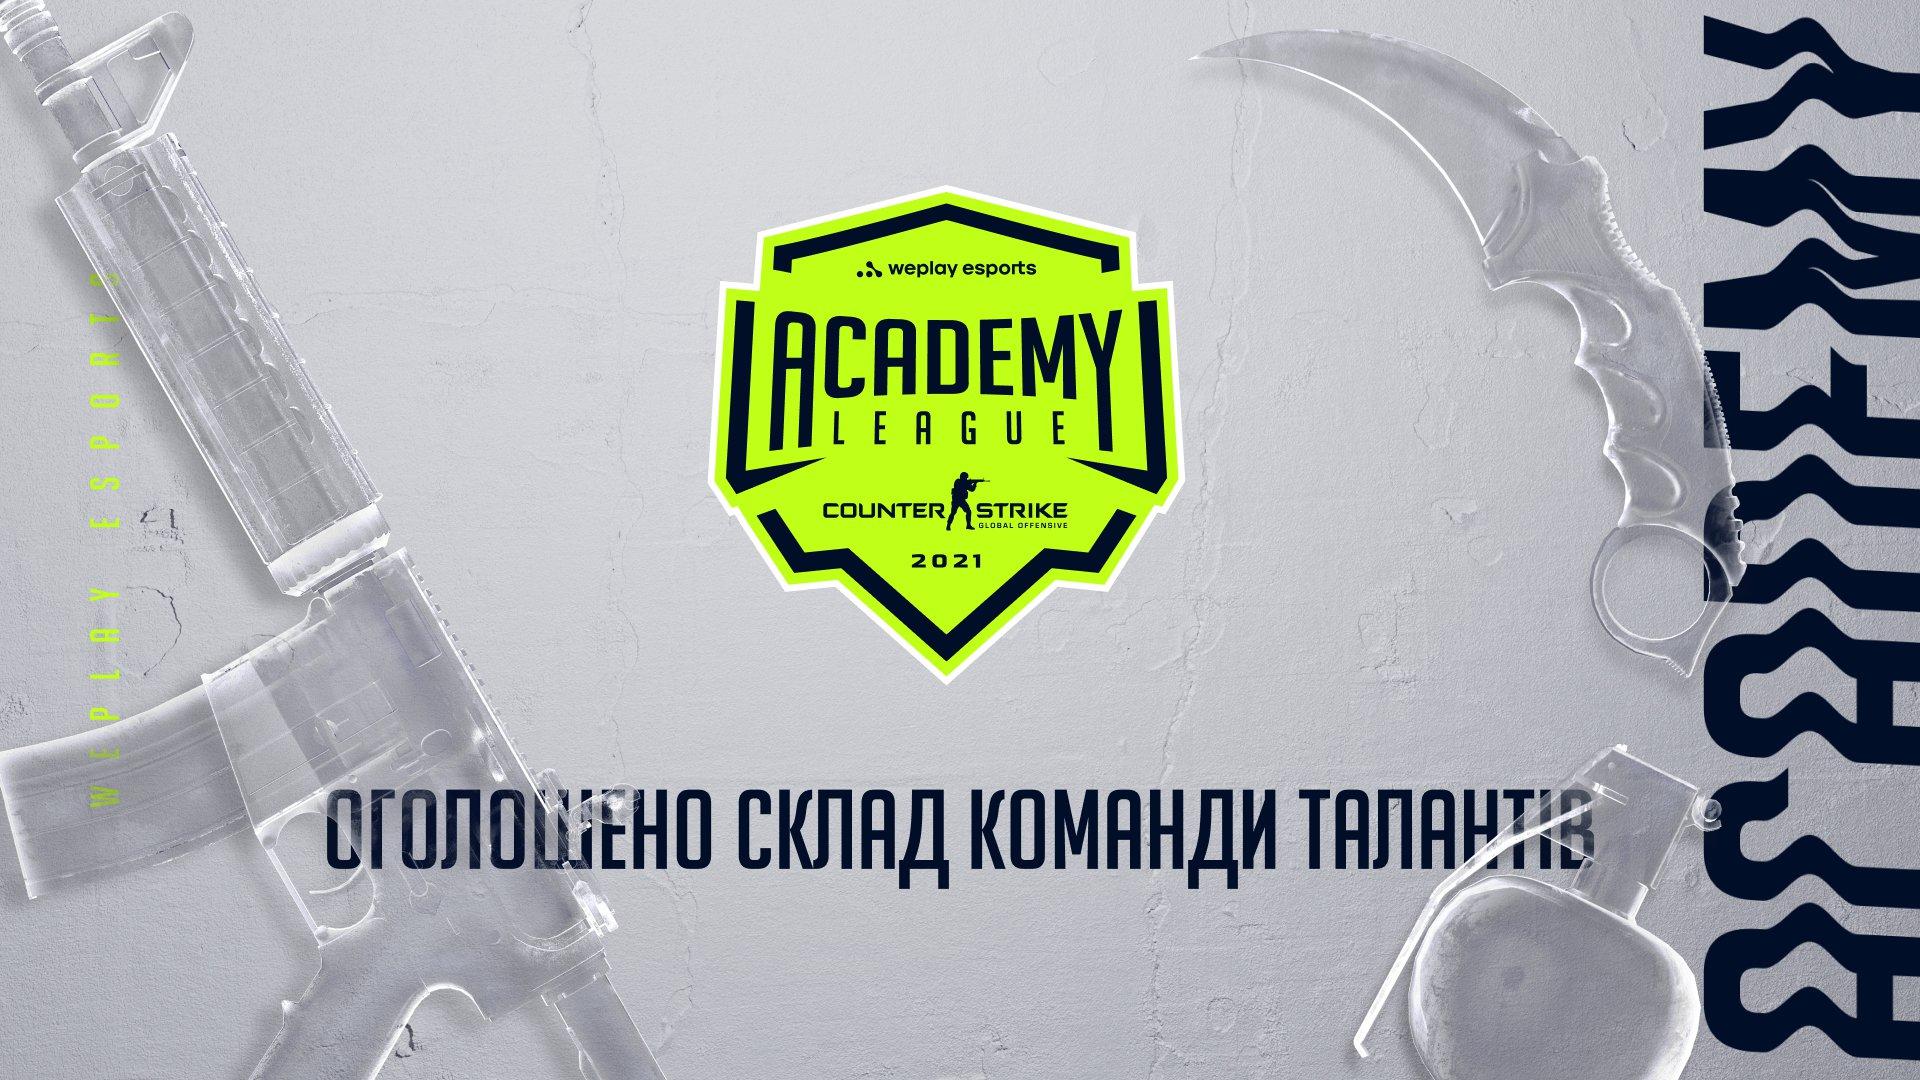 Таланти другого сезону WePlay Academy League. Зображення: WePlay Holding